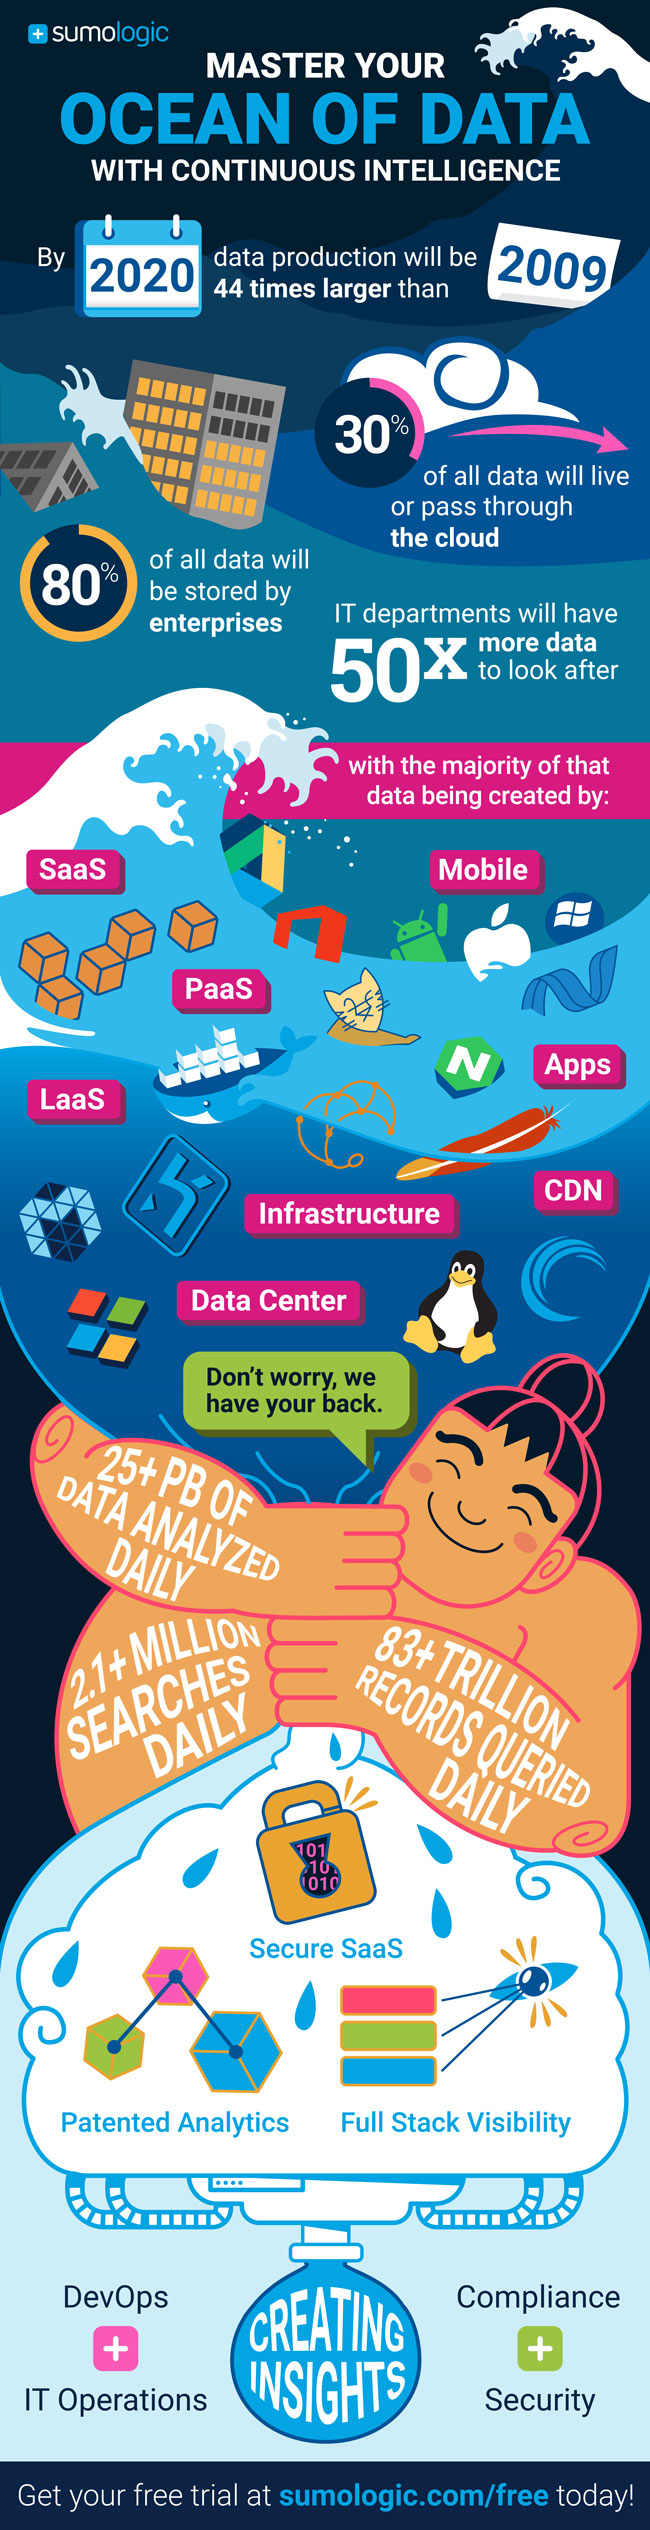 Ocean of Data infographic